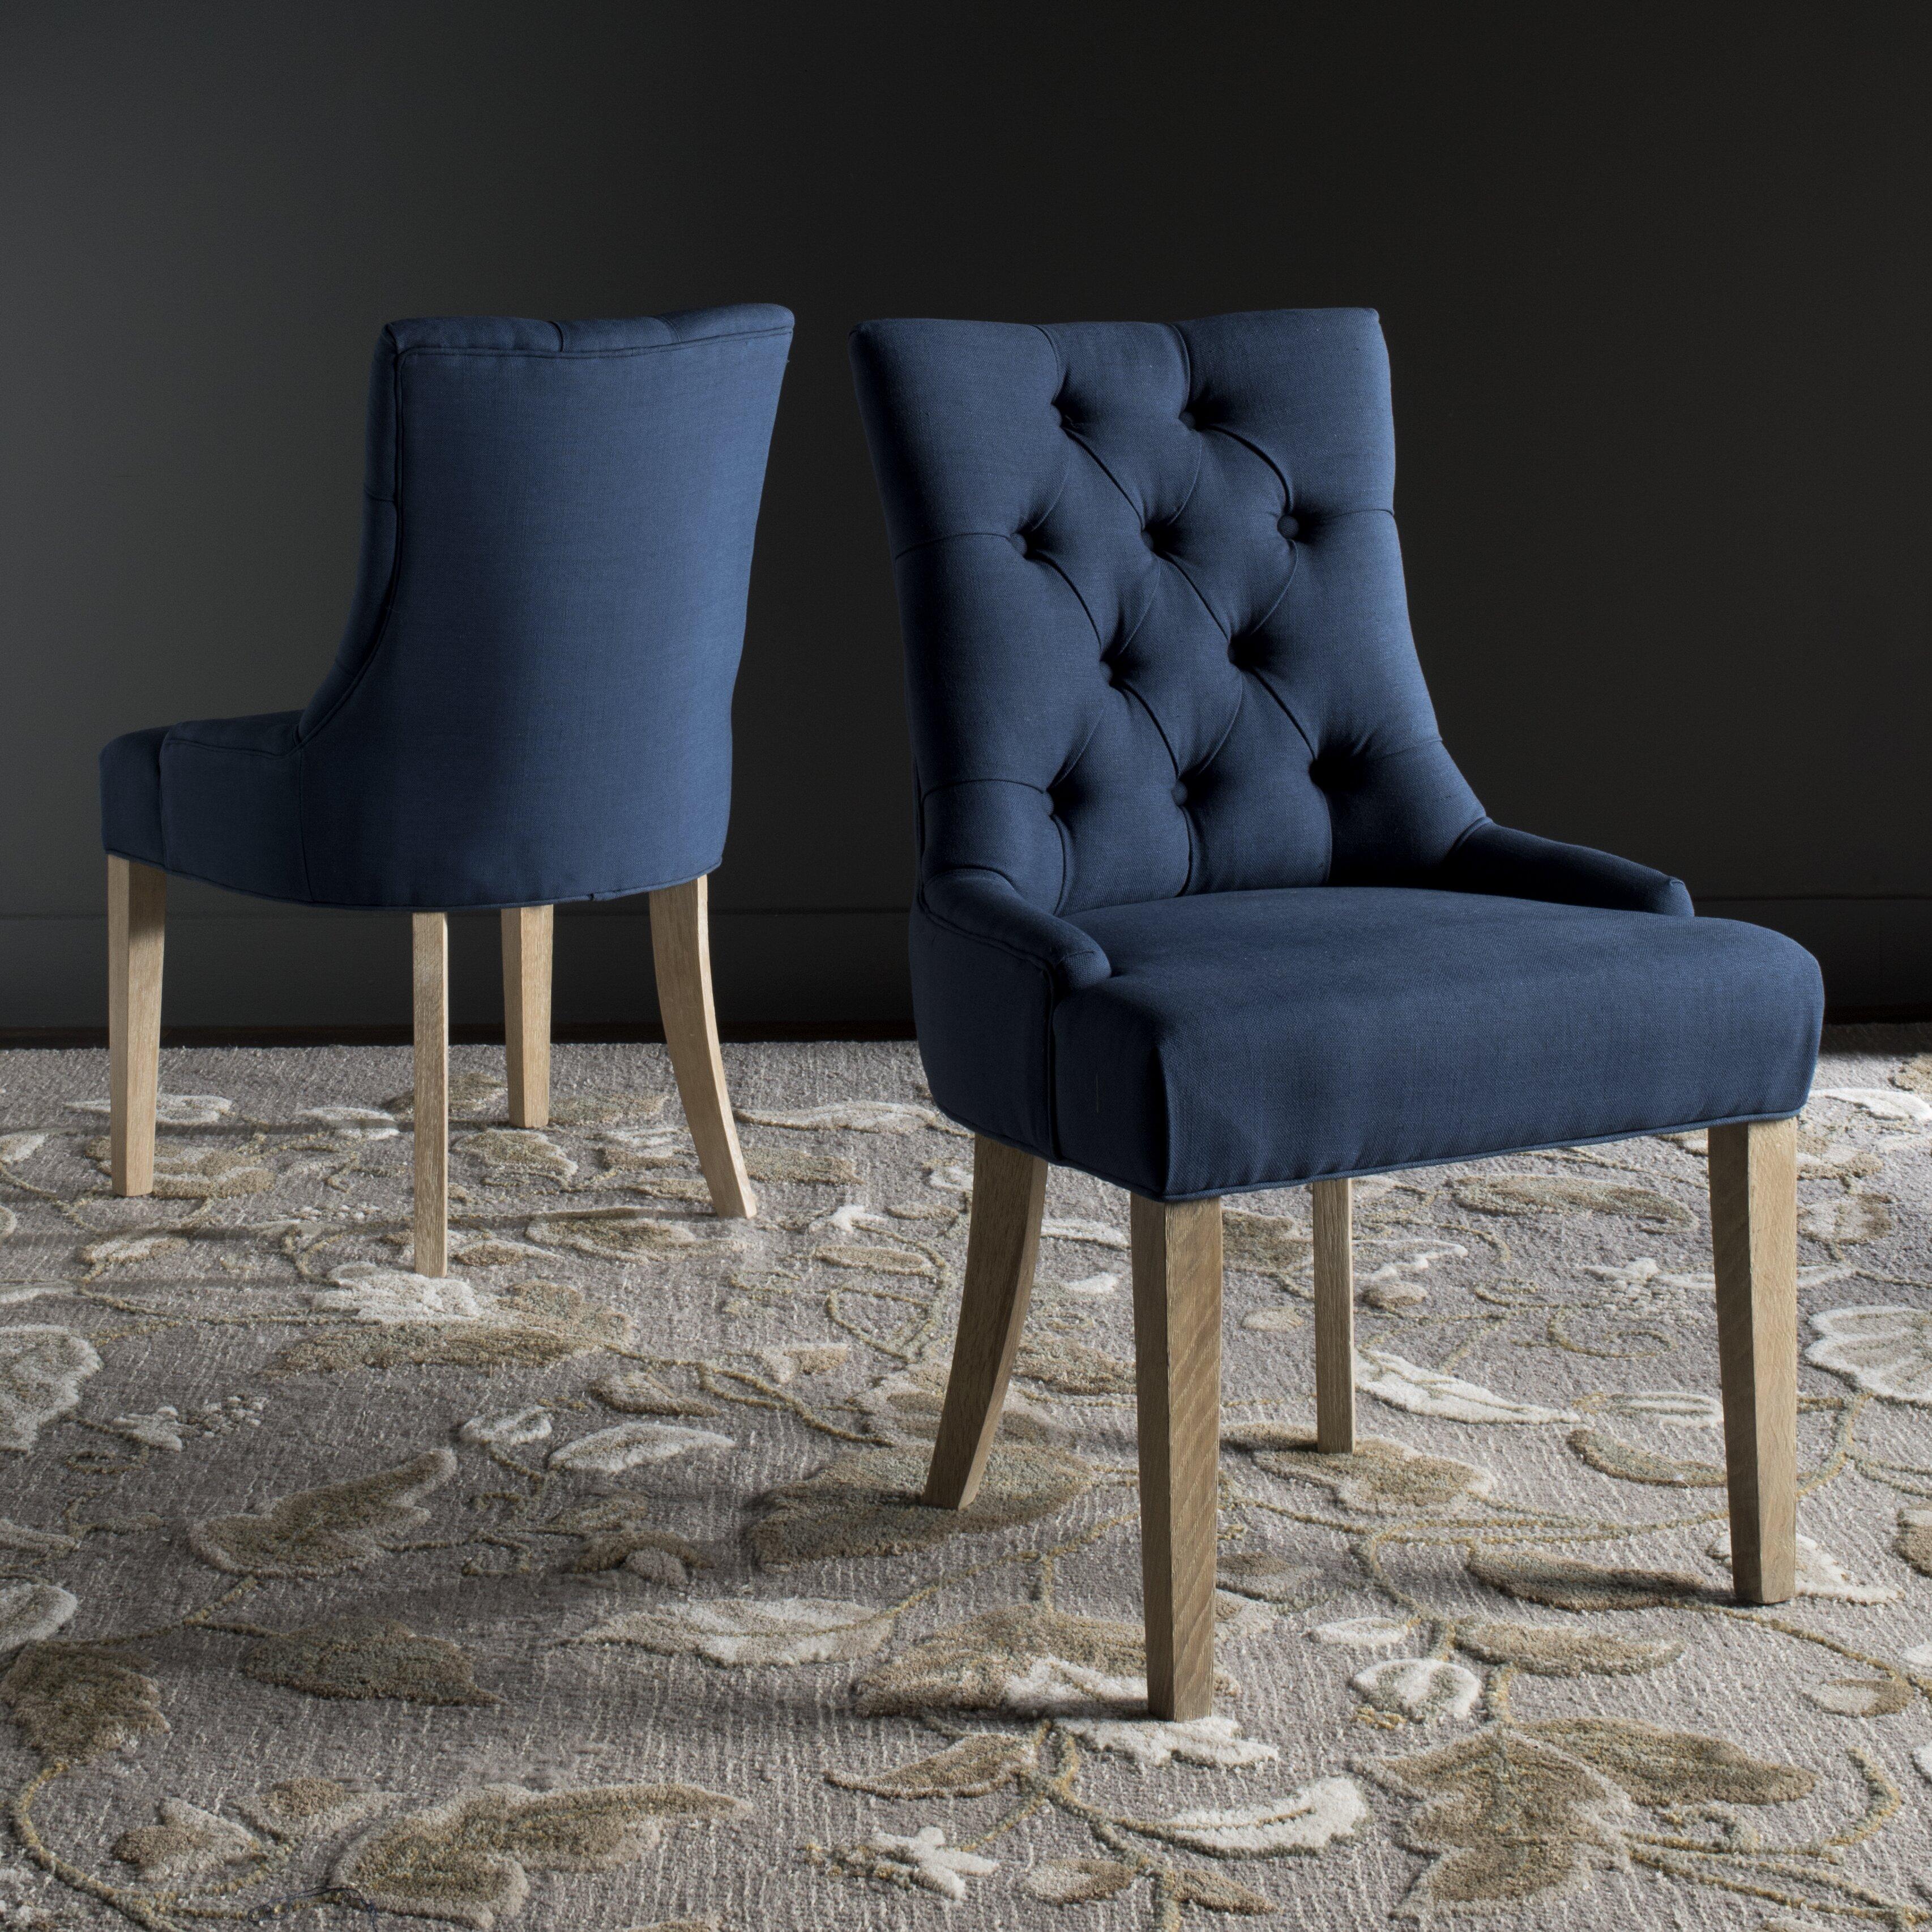 safavieh shaw upholstered dining chair reviews wayfair uk. Black Bedroom Furniture Sets. Home Design Ideas